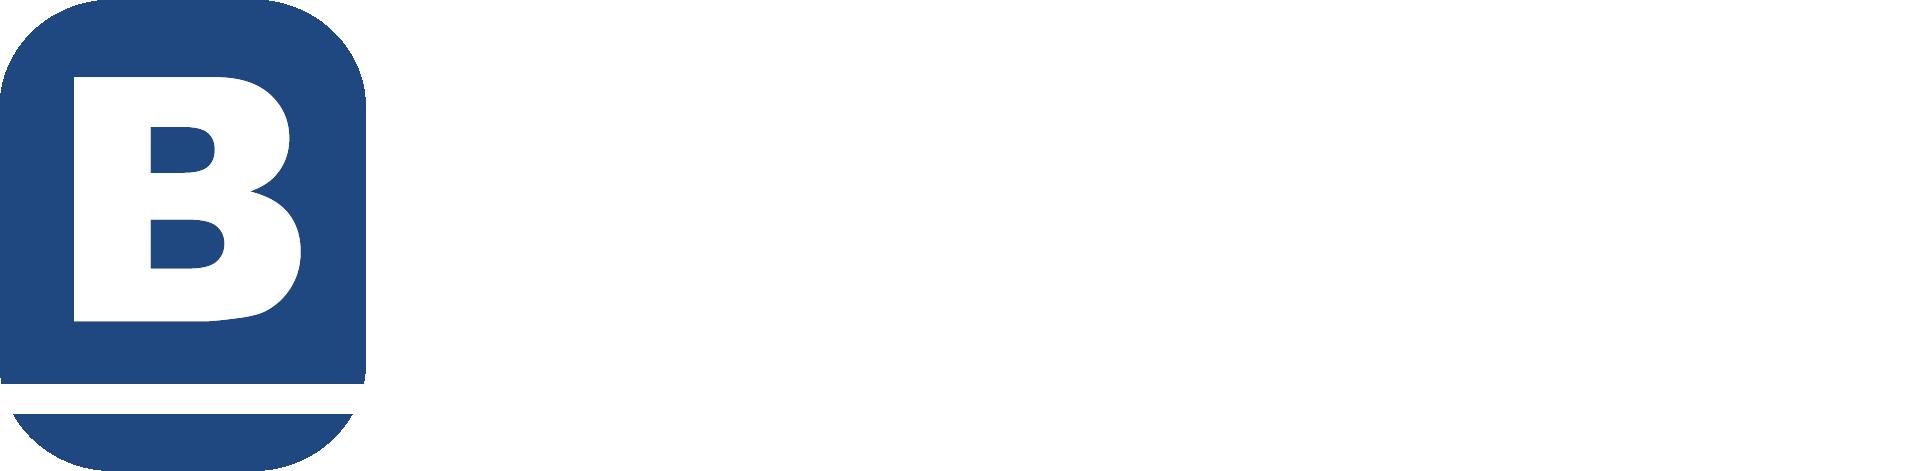 Blachford - Chemical Specialties